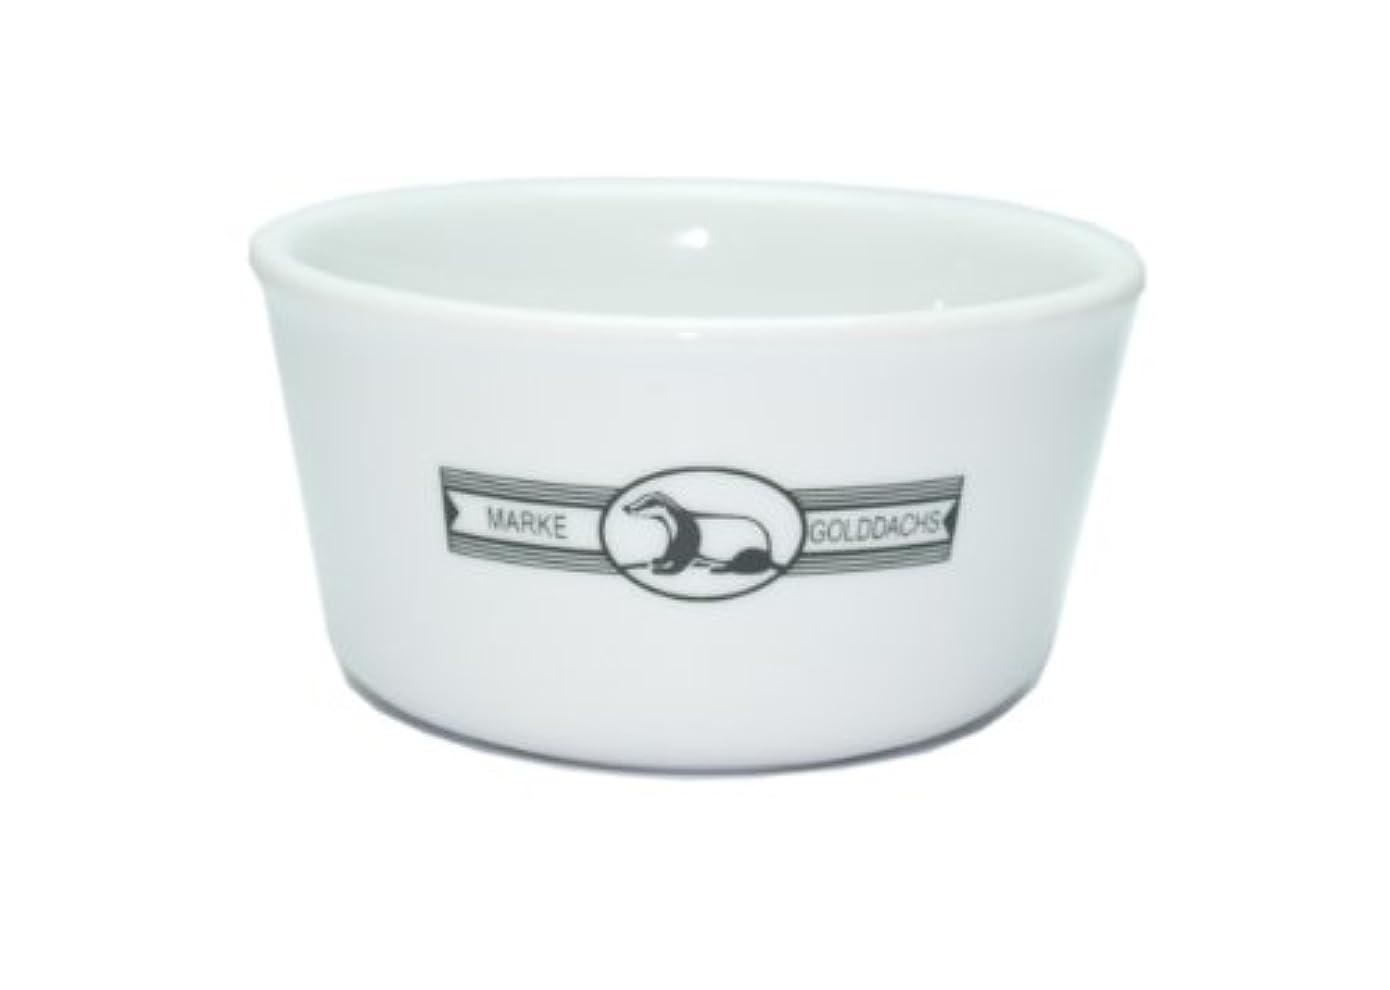 美人絶妙支配的Golddachs Shaving Pot, Porcelain